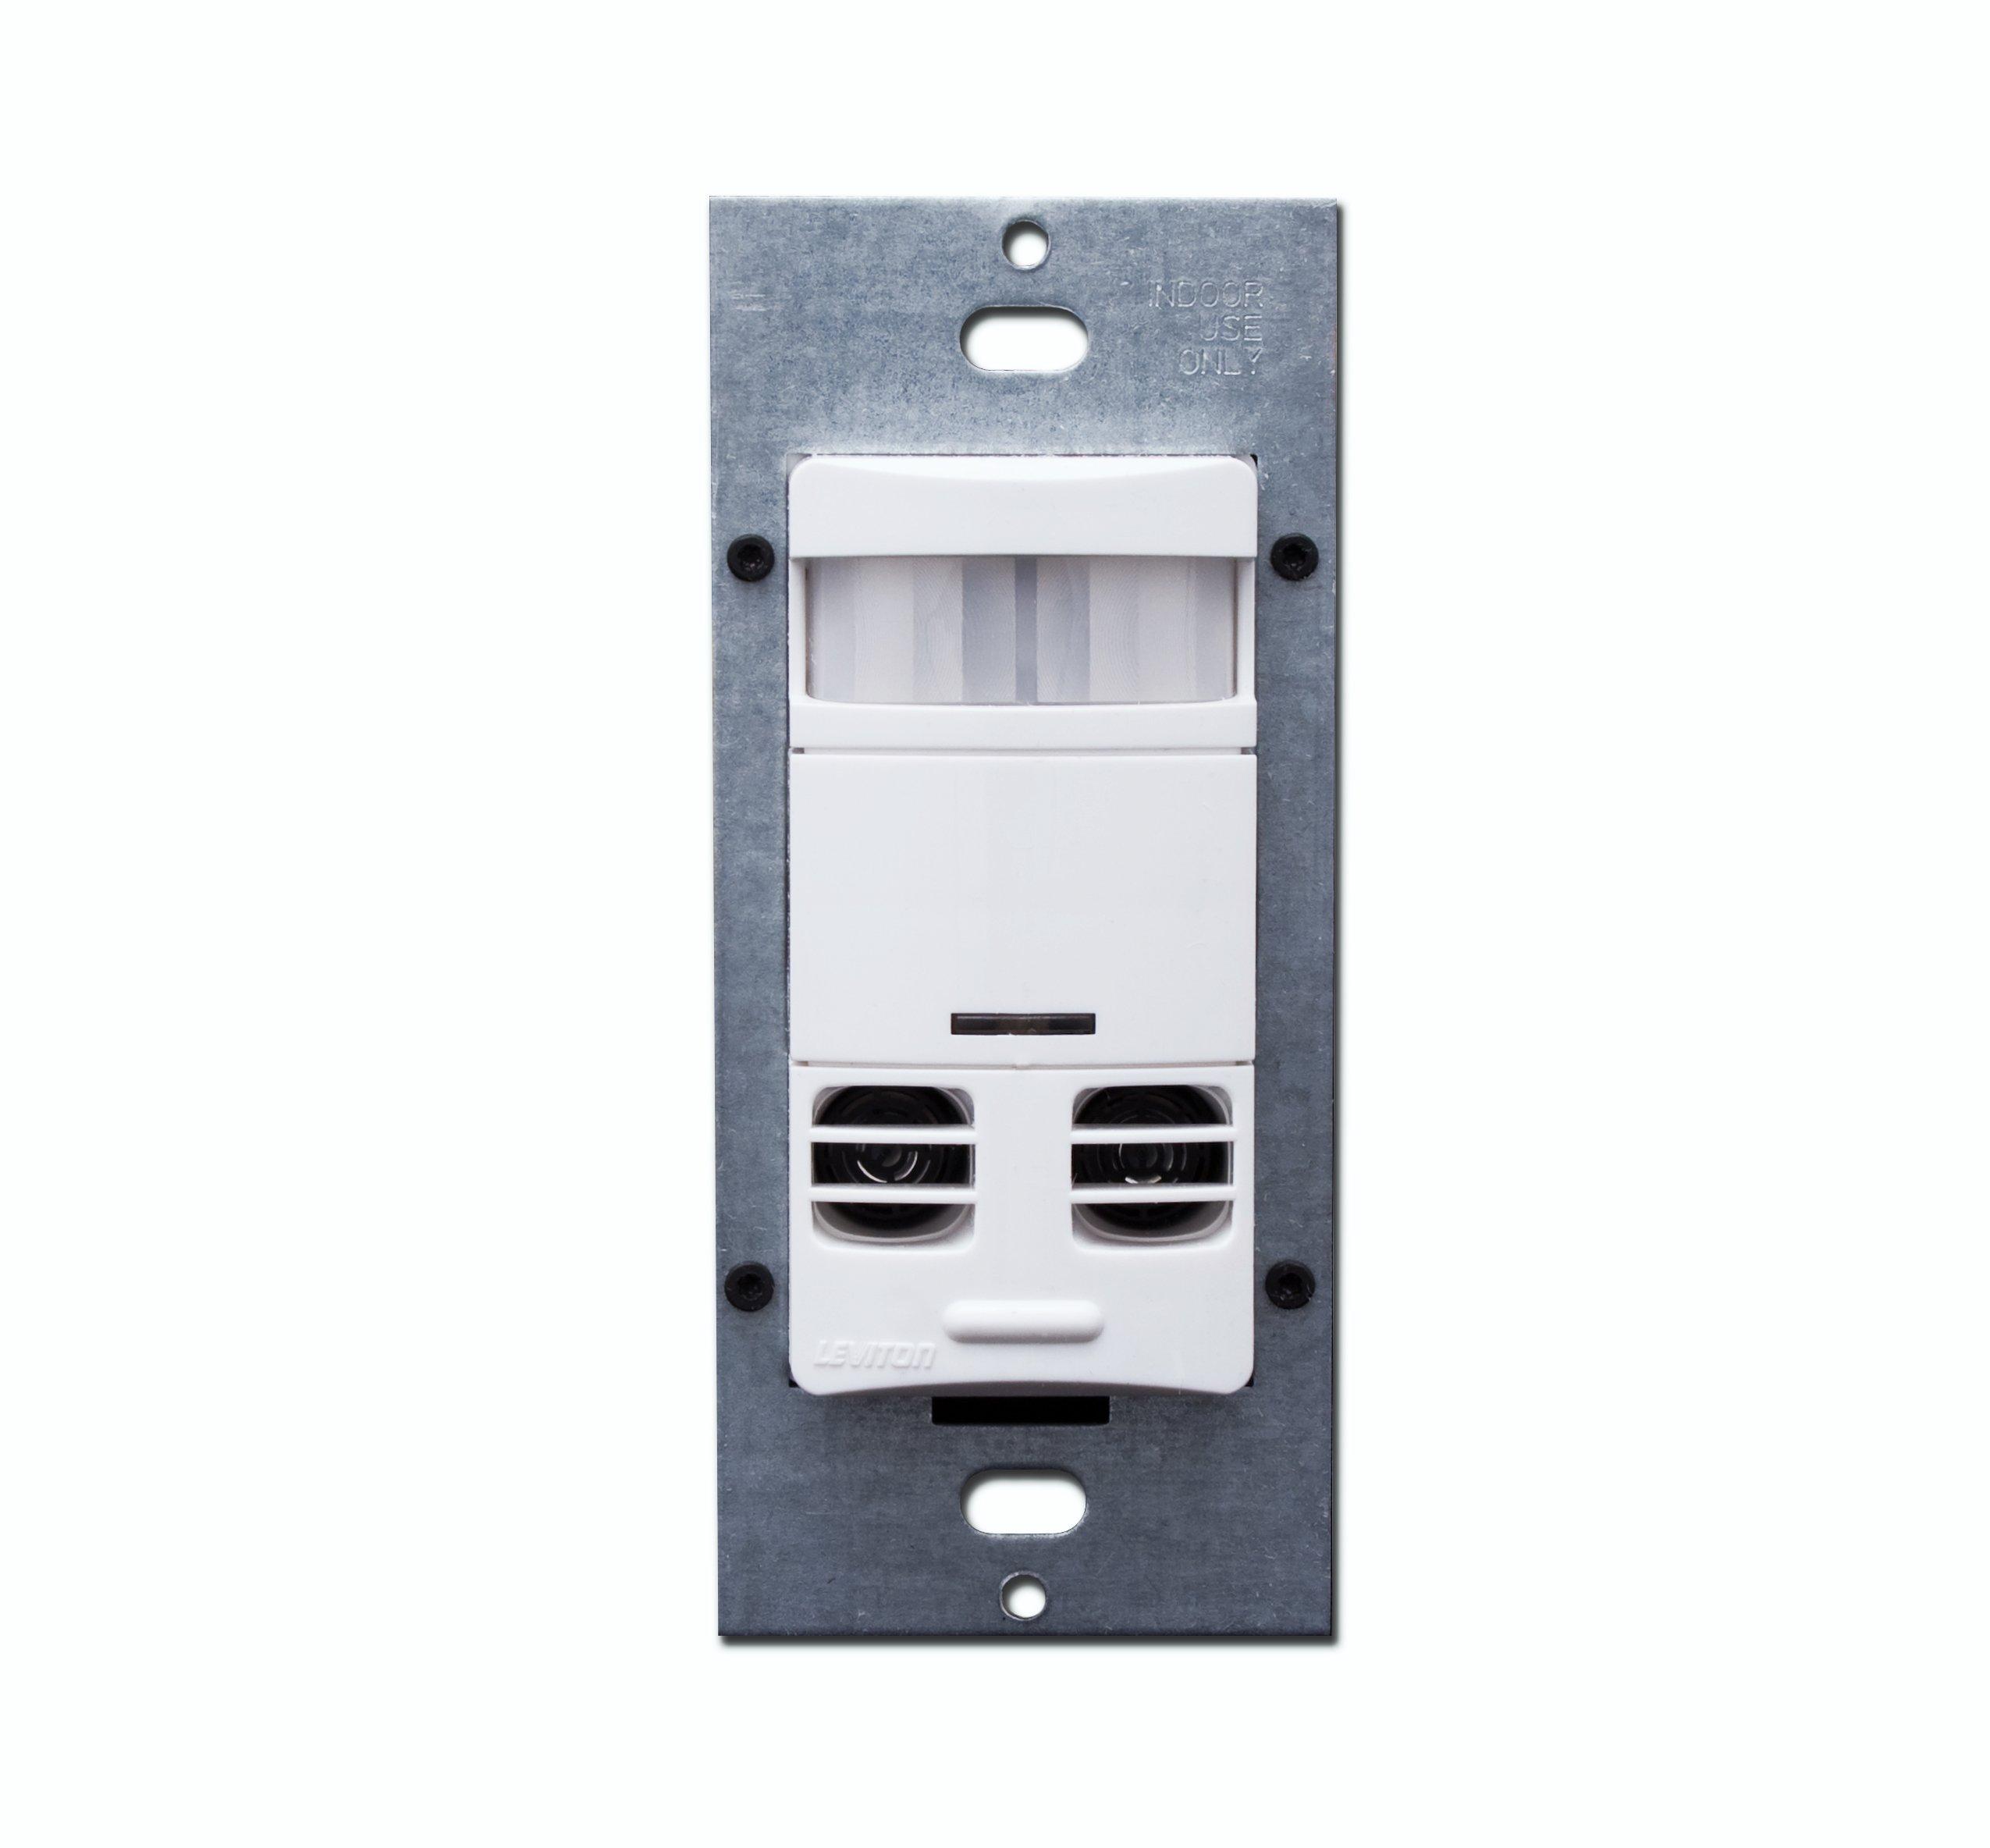 Leviton OSSMT-MDW Ultrasonic/Infrared Wall Switch Sensor, White